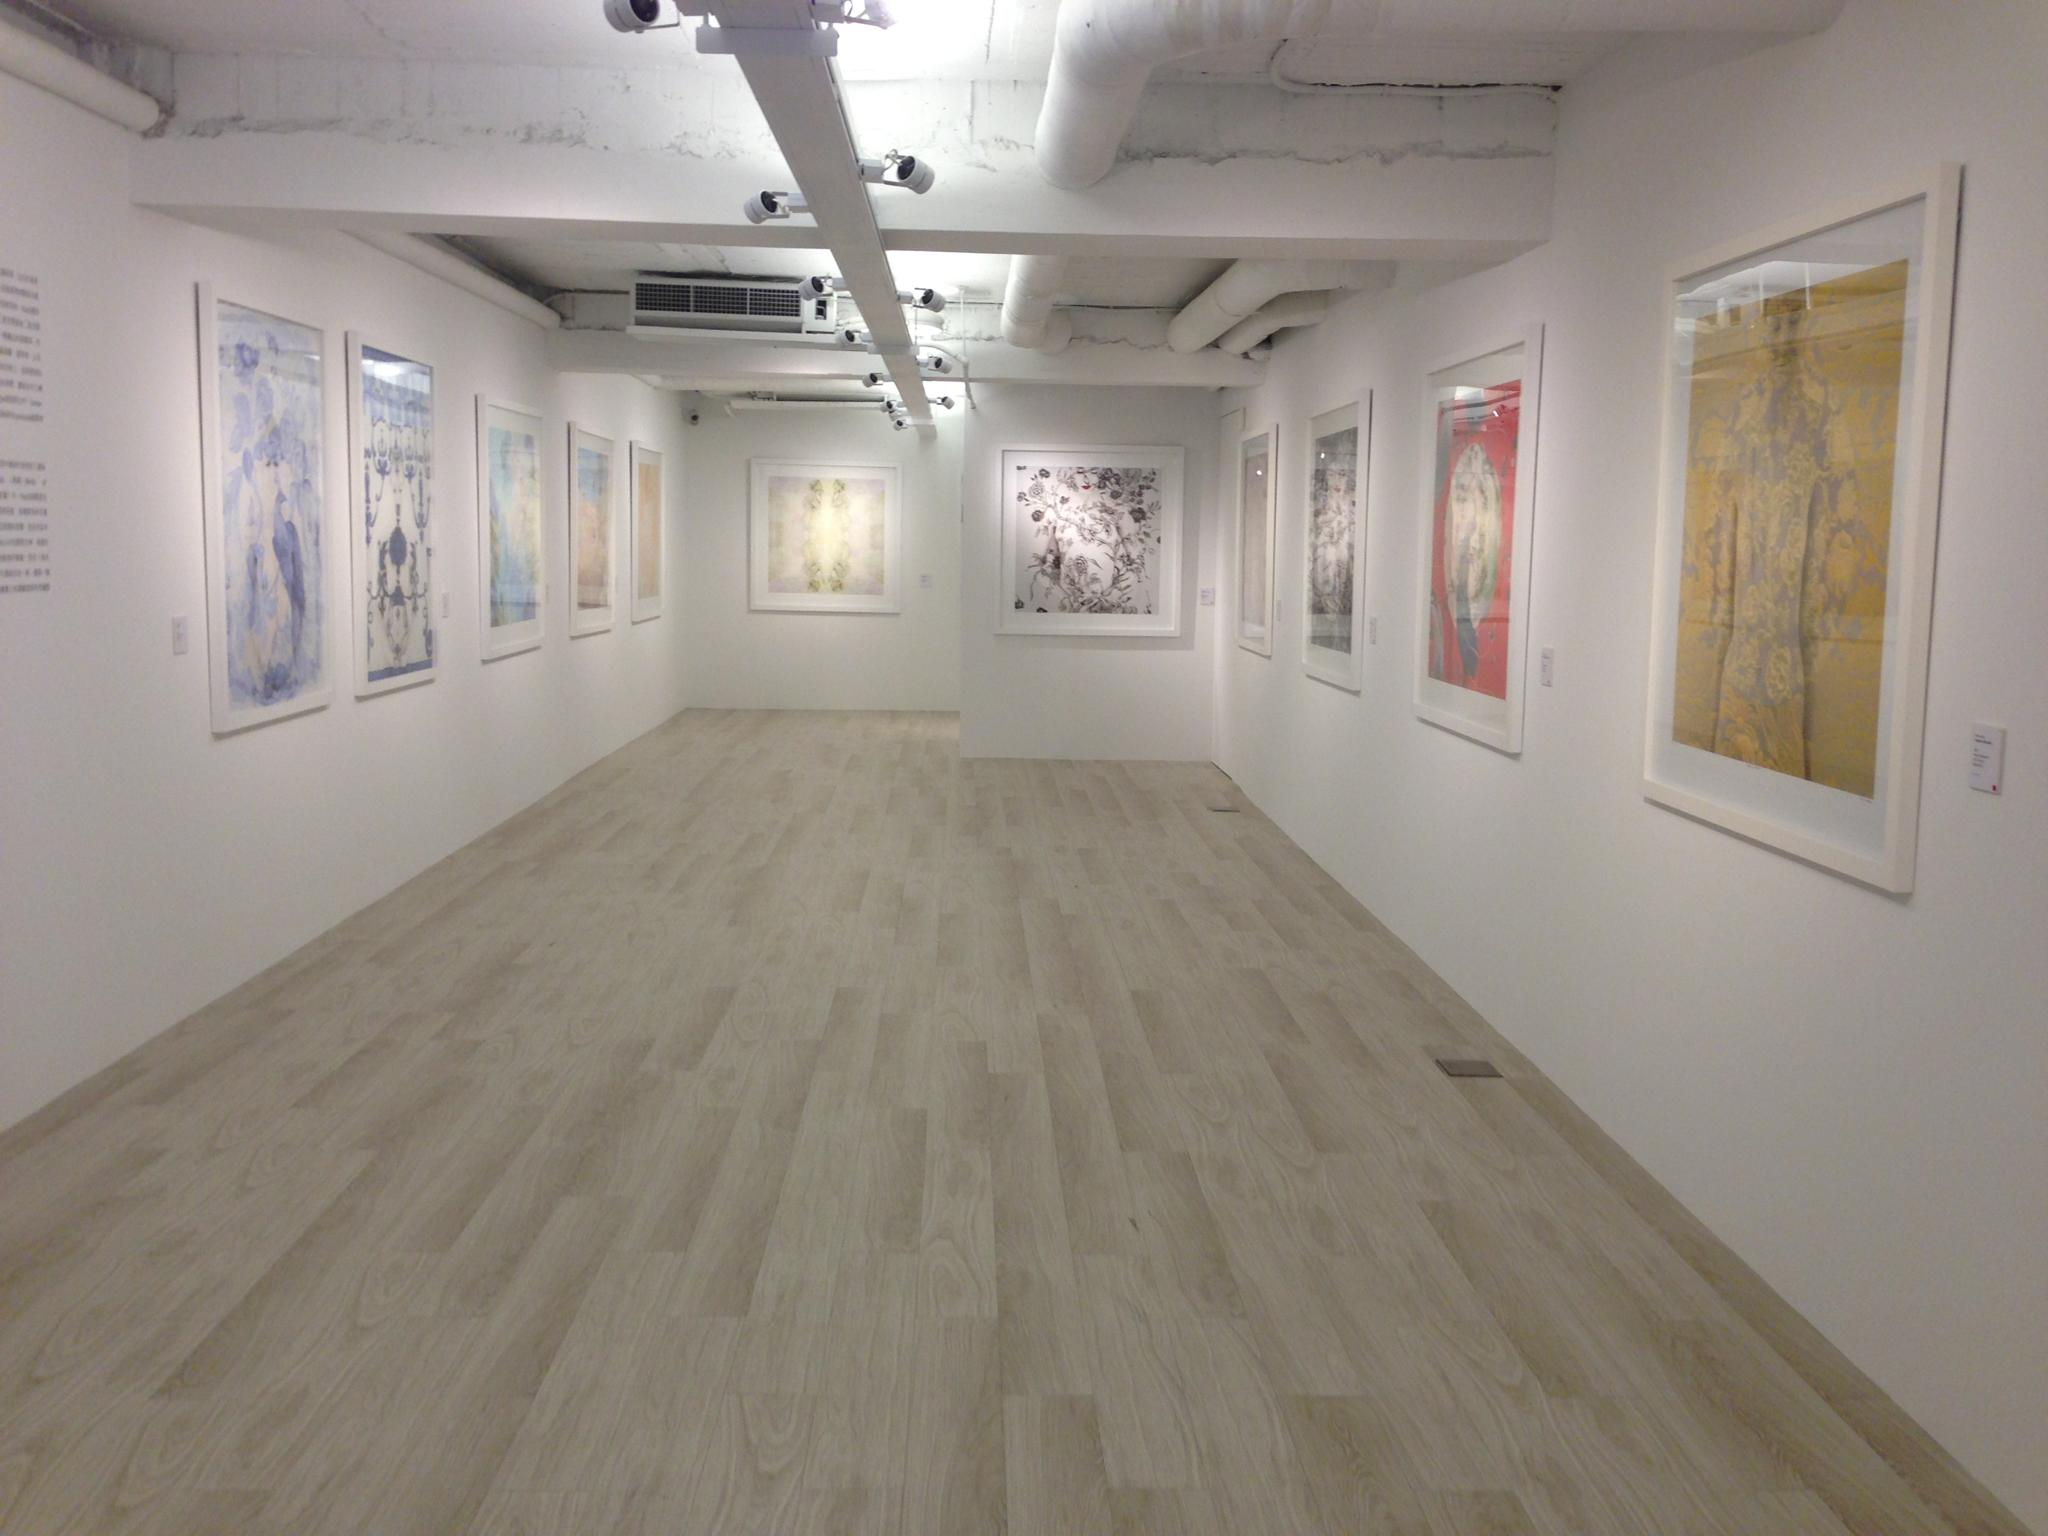 B Art: Zhou B Art Center (Chicago) & Bluerider Art (Taipei